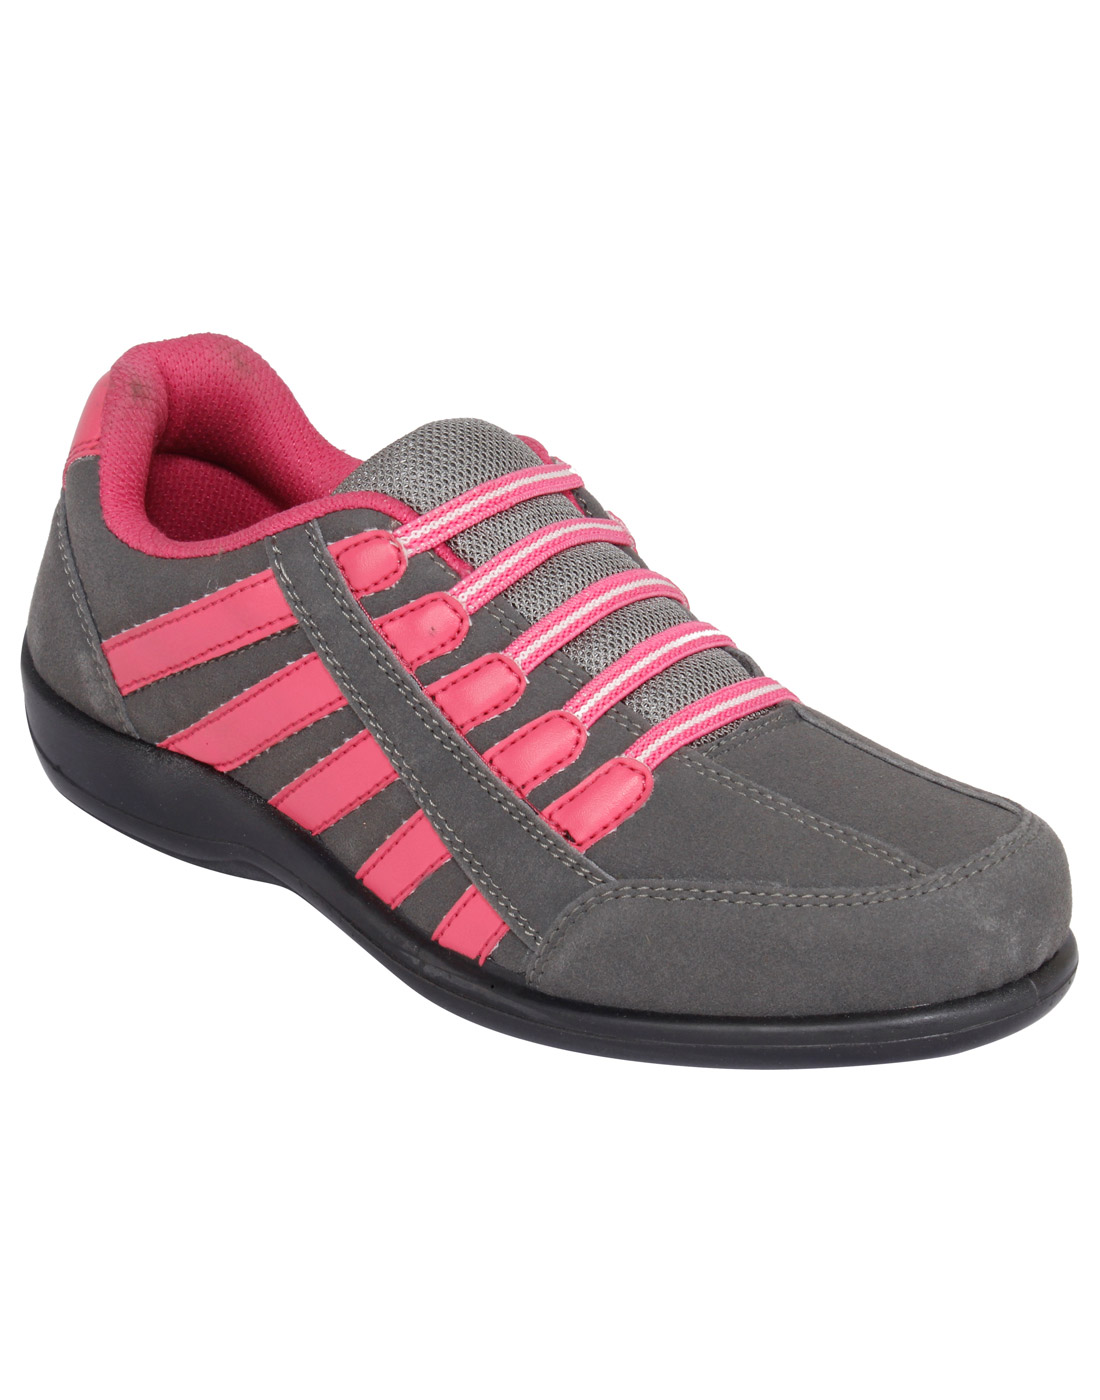 Rlx 03 Grey Pink Rex Shoes